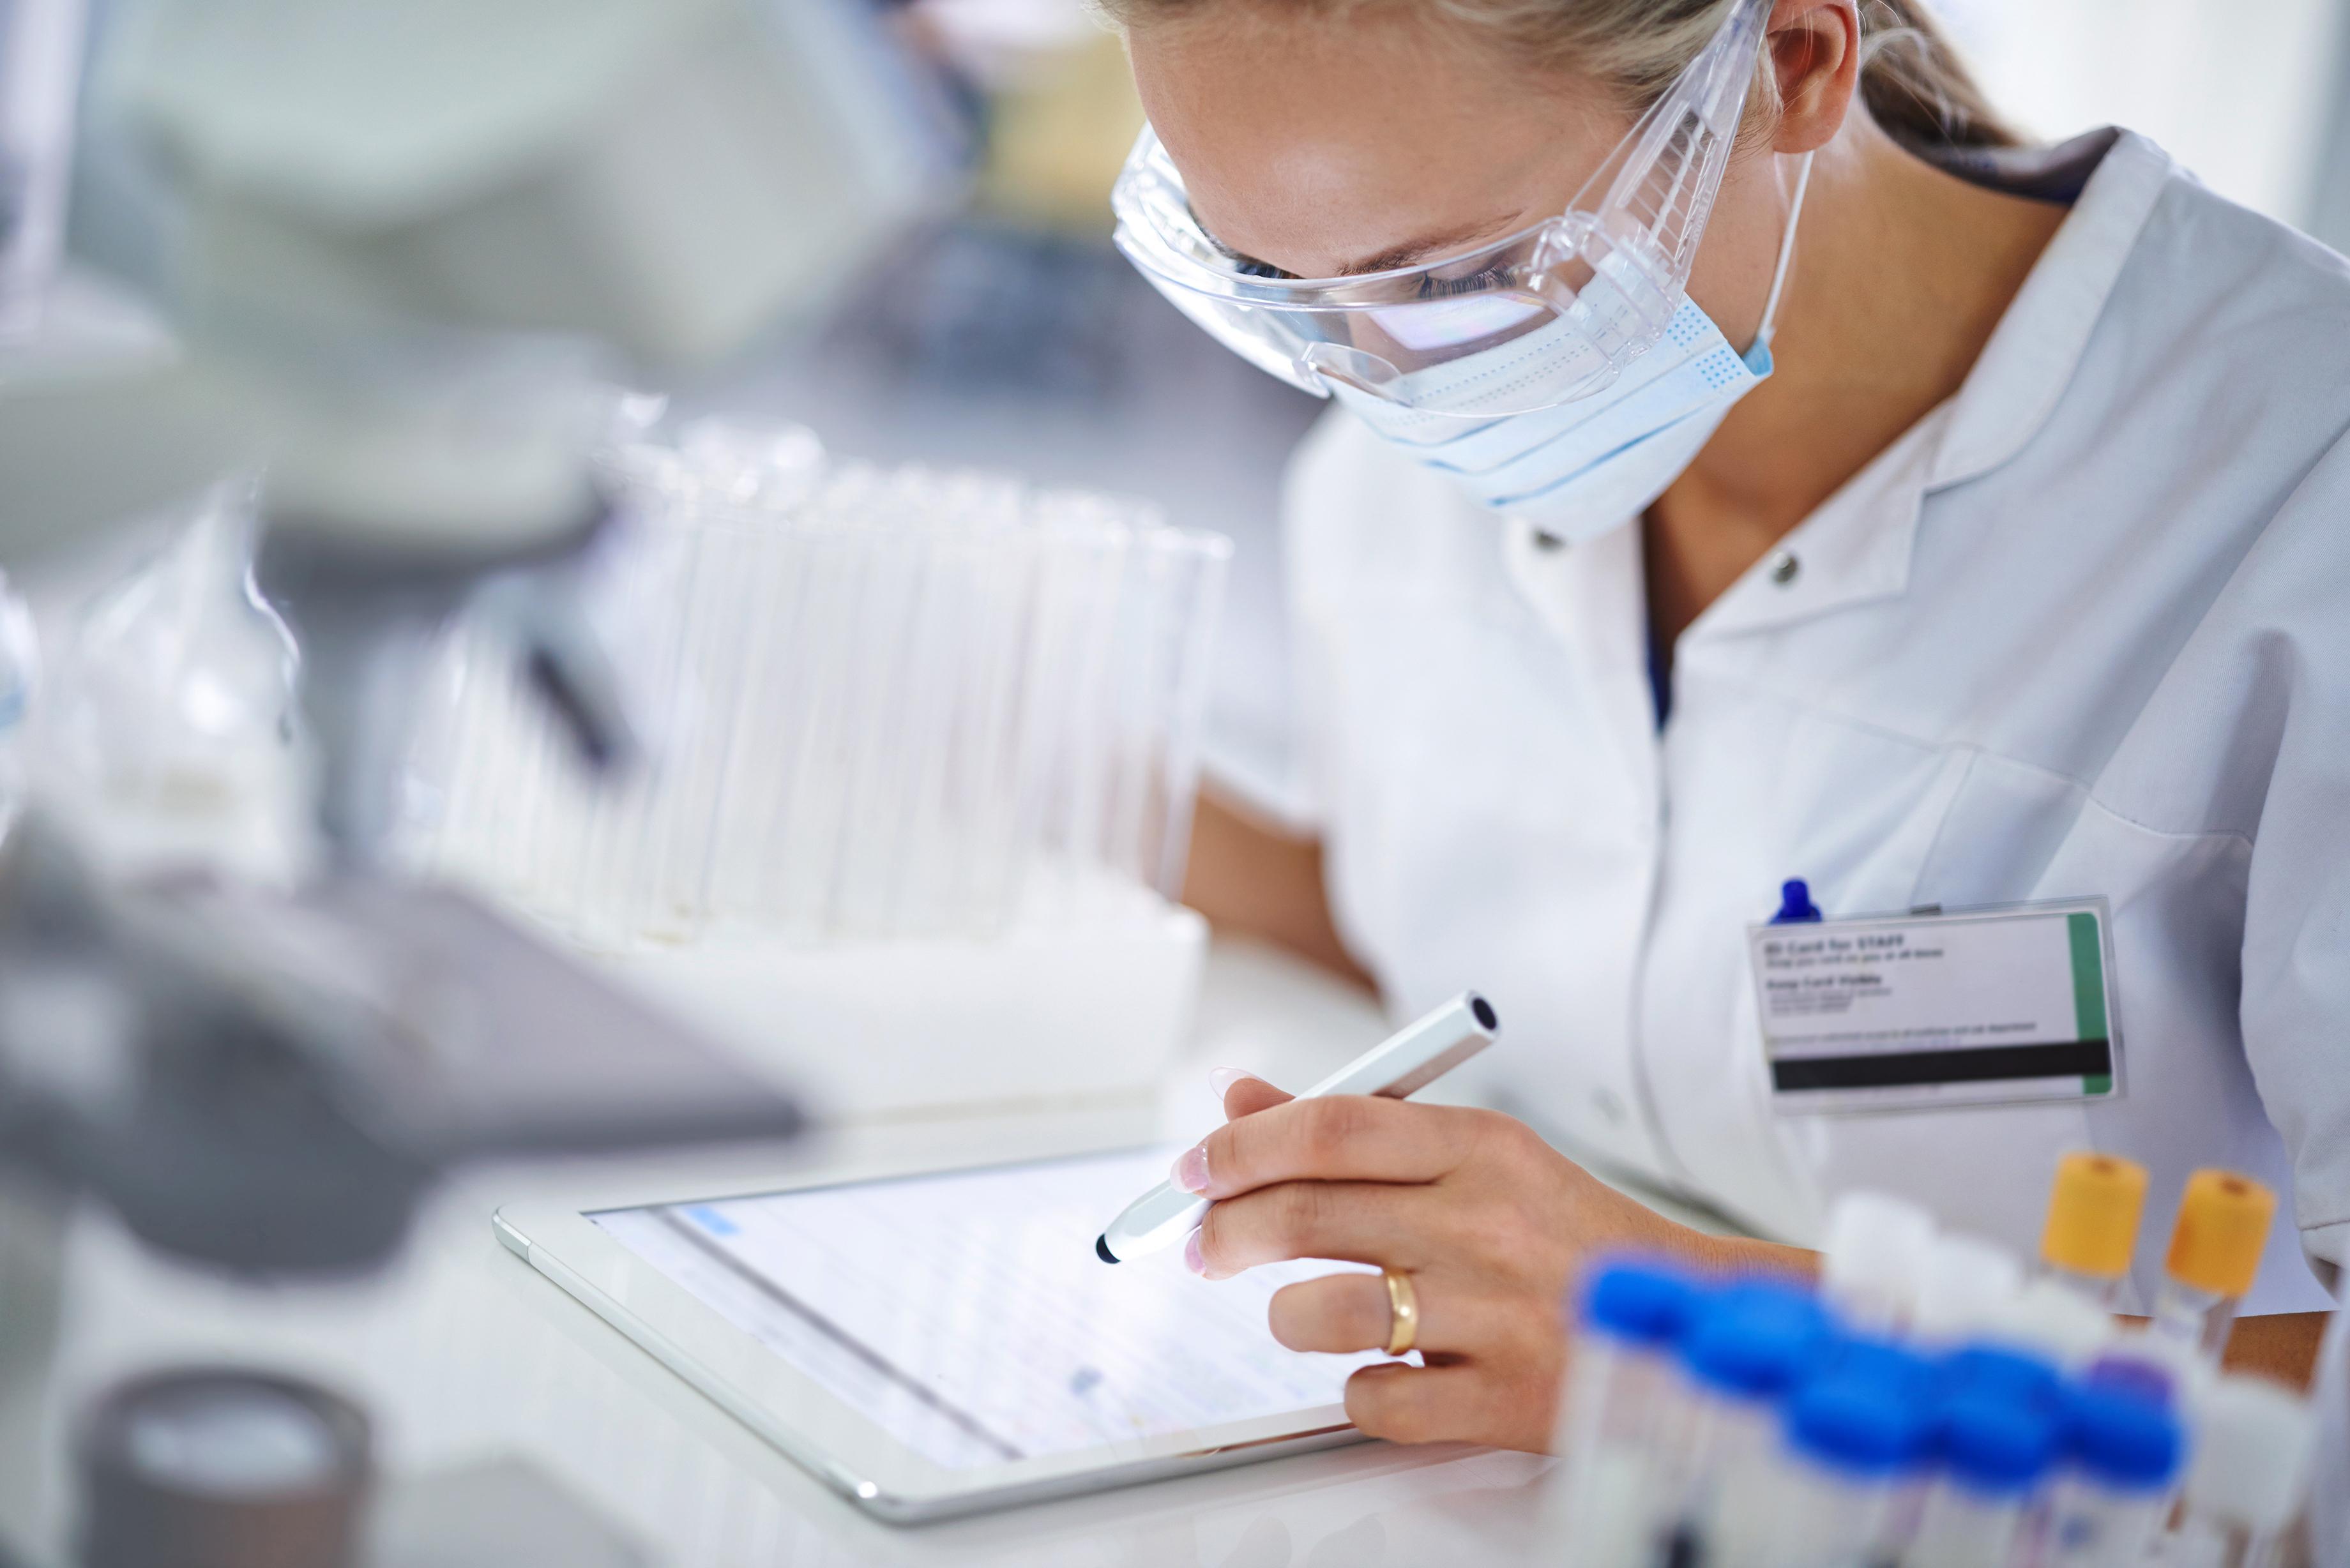 ALL_labtech_woman_tablet_rgb_150